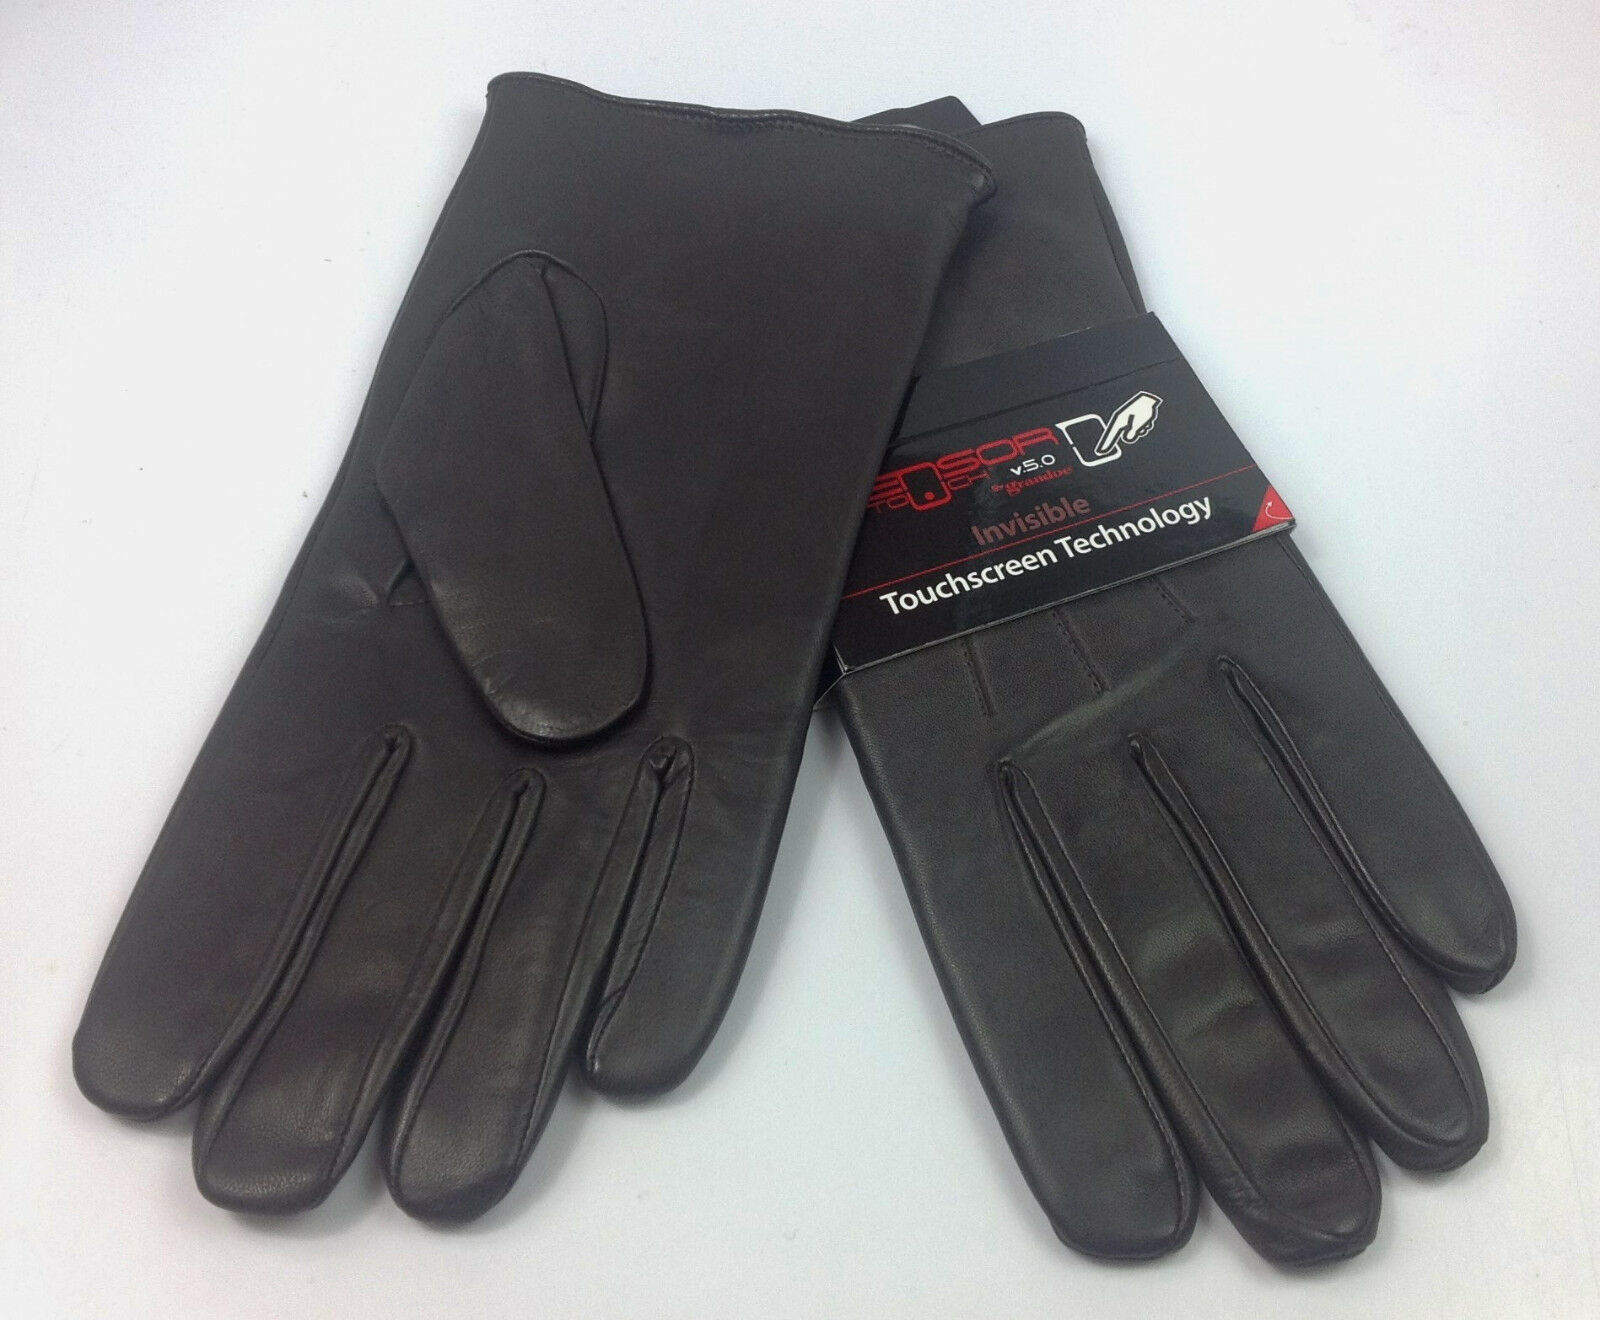 Men's Brown Leather Gloves Grandoe Touchscreen Tech LG